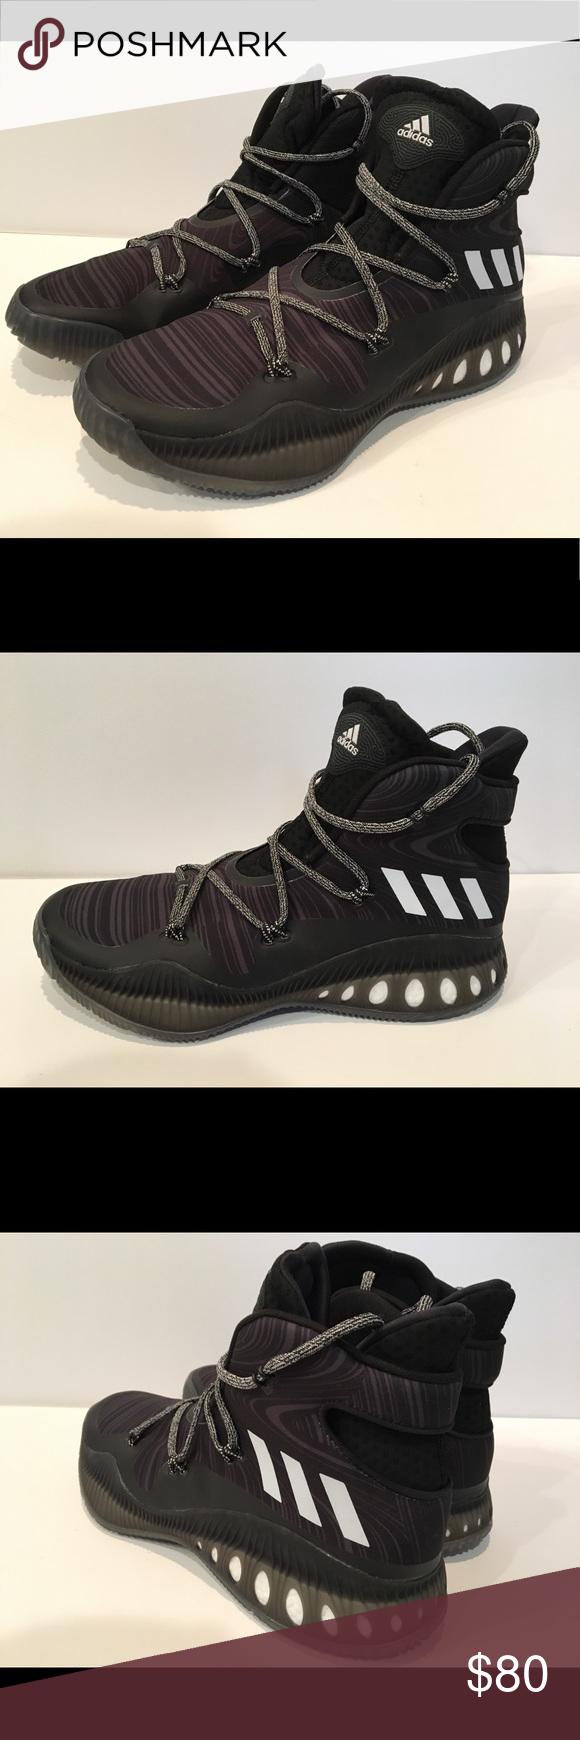 Adidas Crazy Explosive Boost Size 14